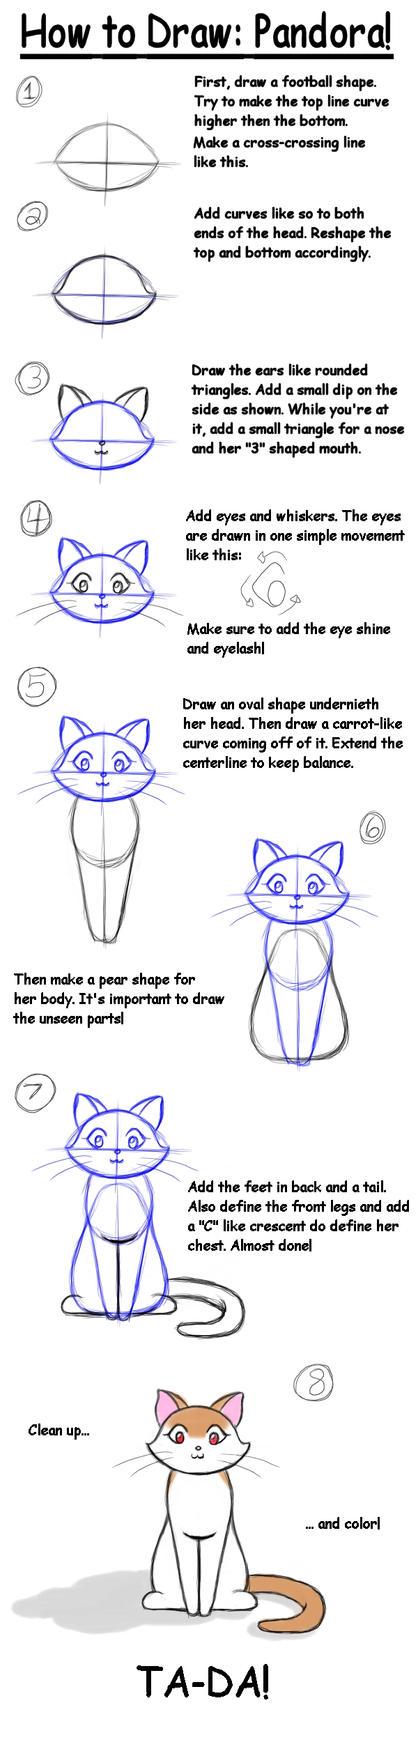 How to Draw: Pandora